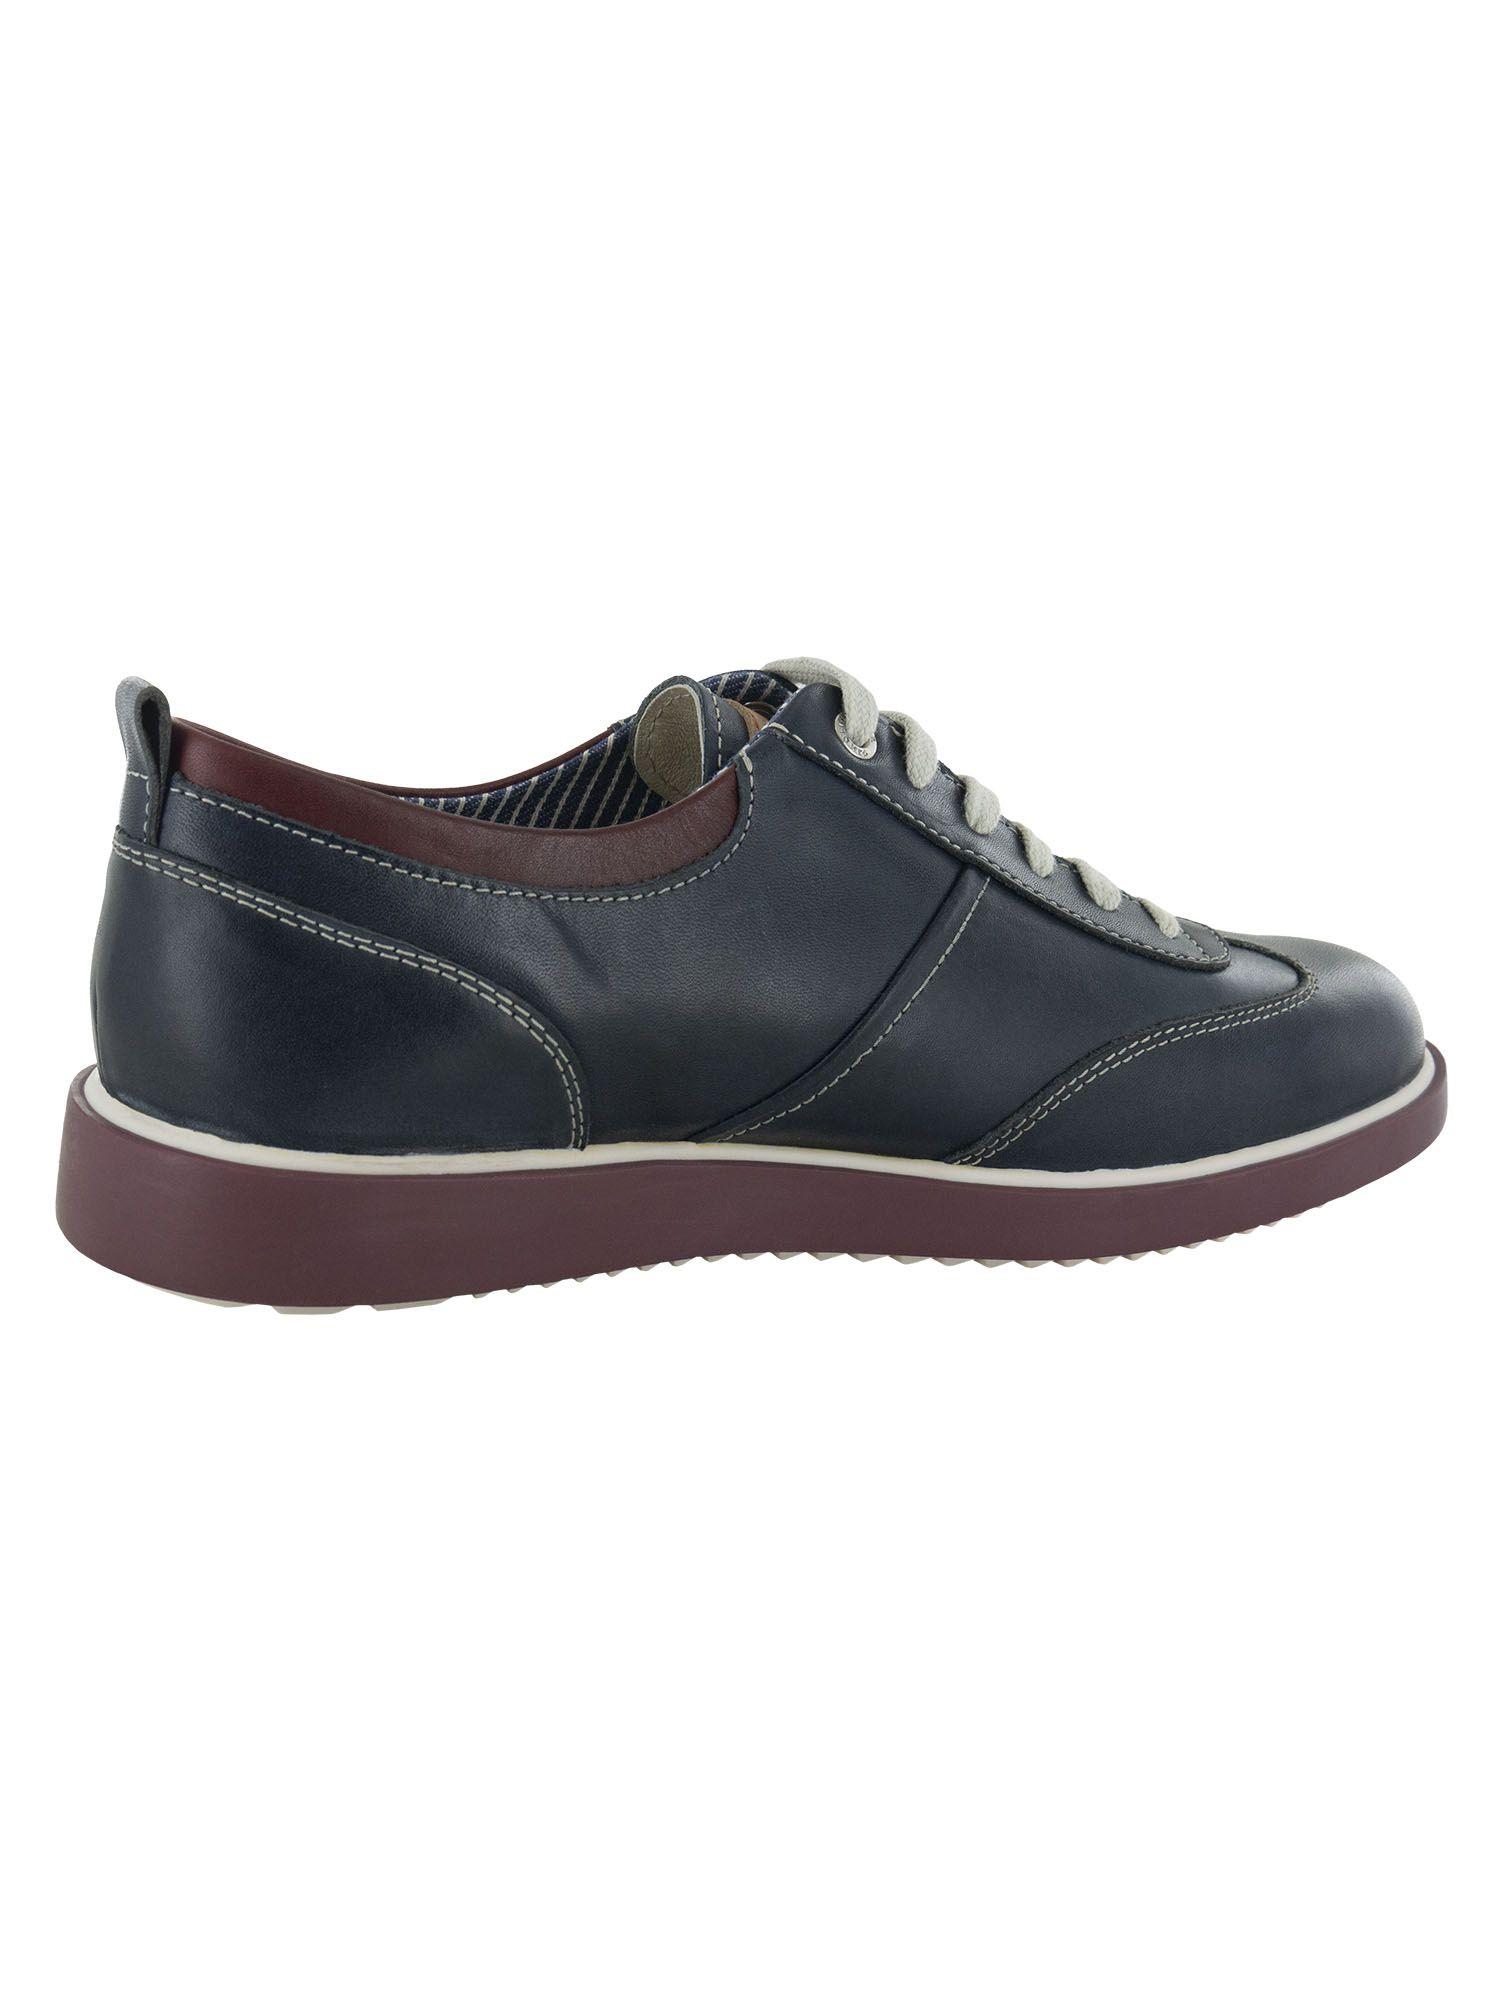 Pikolinos Mens Corcega M2P-4261 Sneaker Shoes, Blue, 40 M EU / 6.5-7 M US